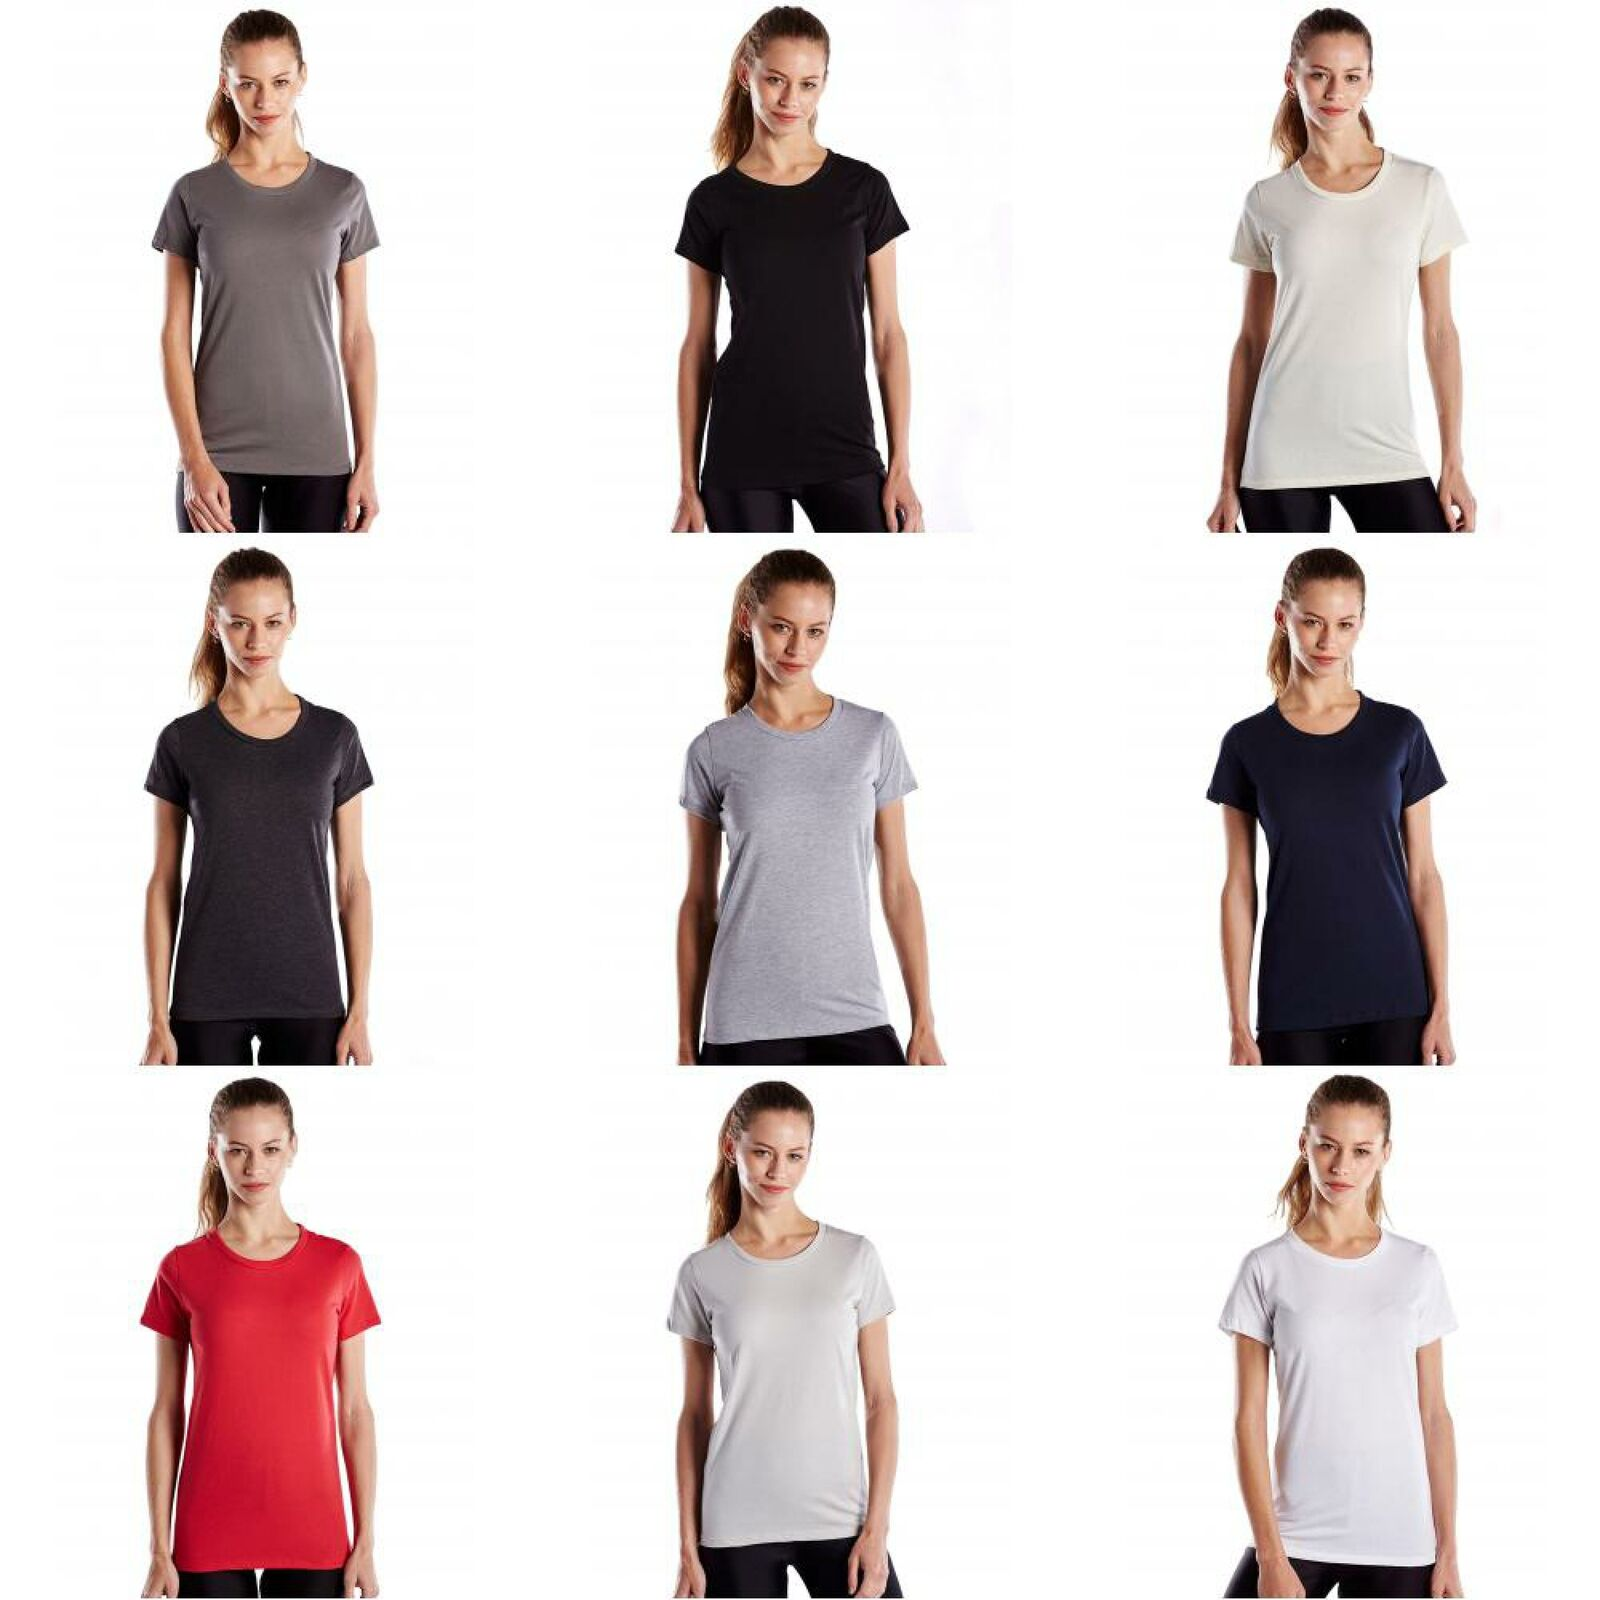 917a2448a3f2 US Blanks Women's Made in USA Short Sleeve Crewneck T-Shirt | eBay